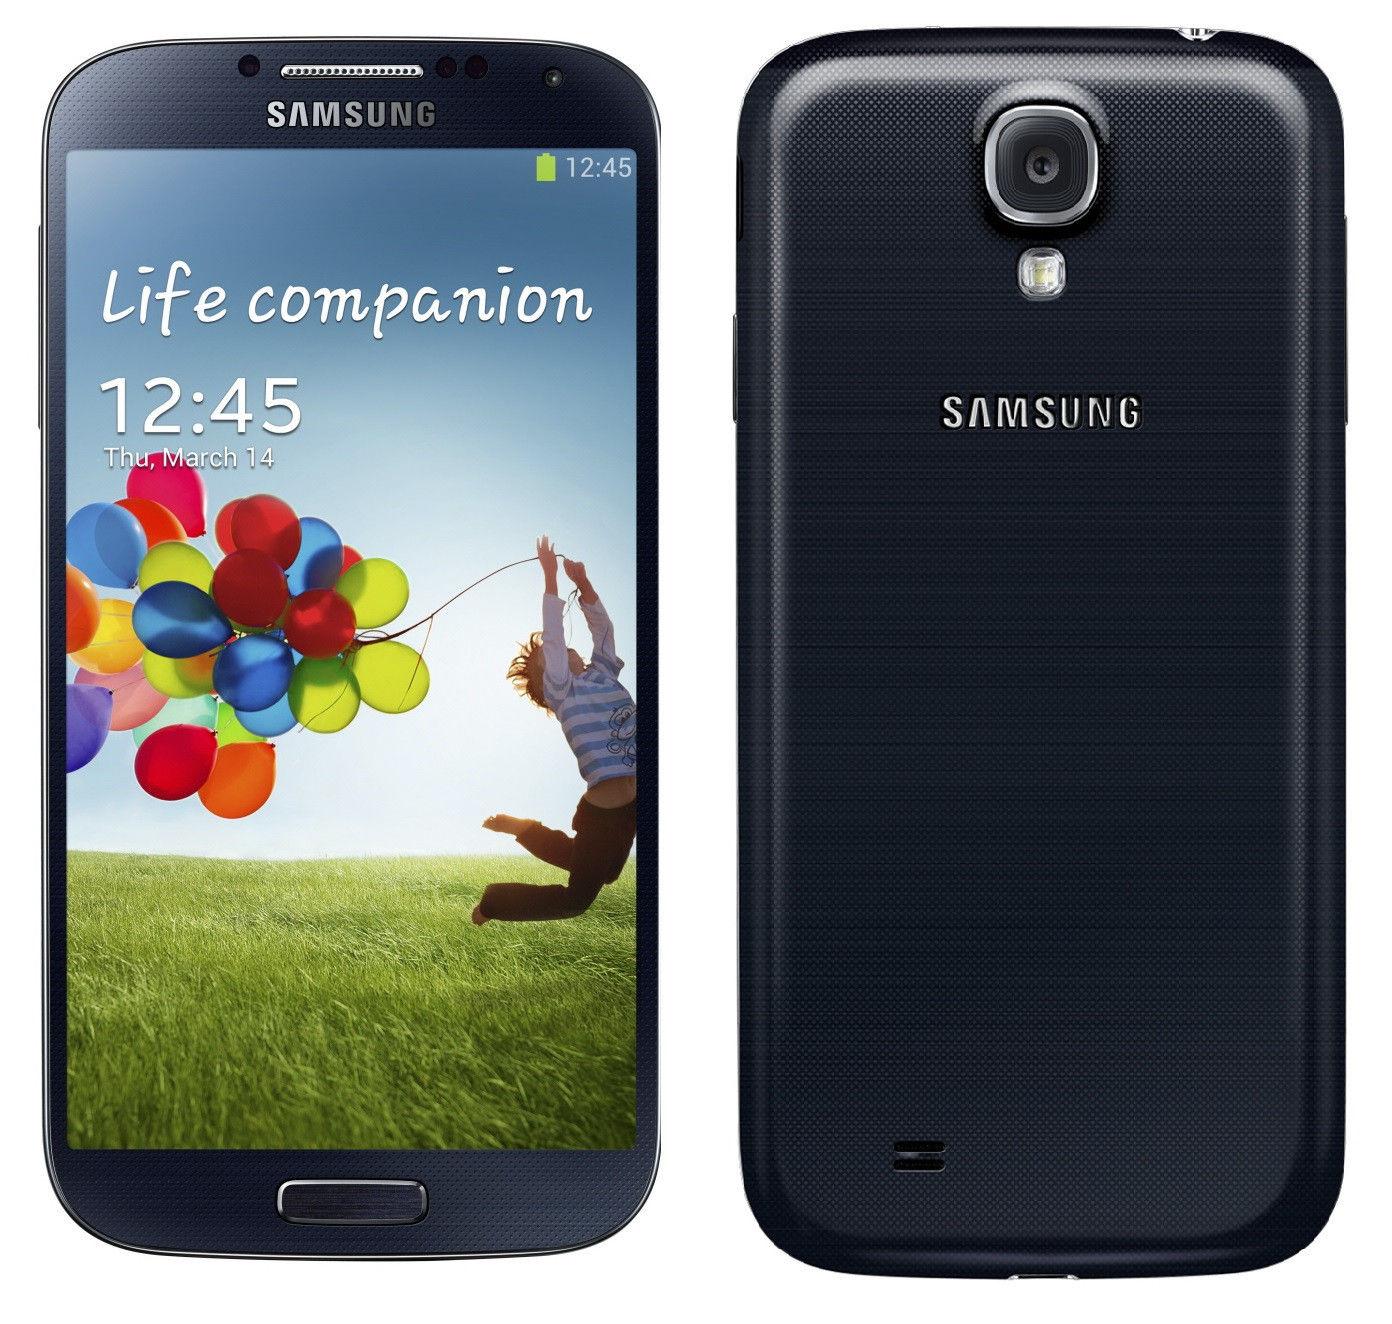 Smartphone Samsung Galaxy S4 16Go (Import US) - Frais de port et taxes incluses